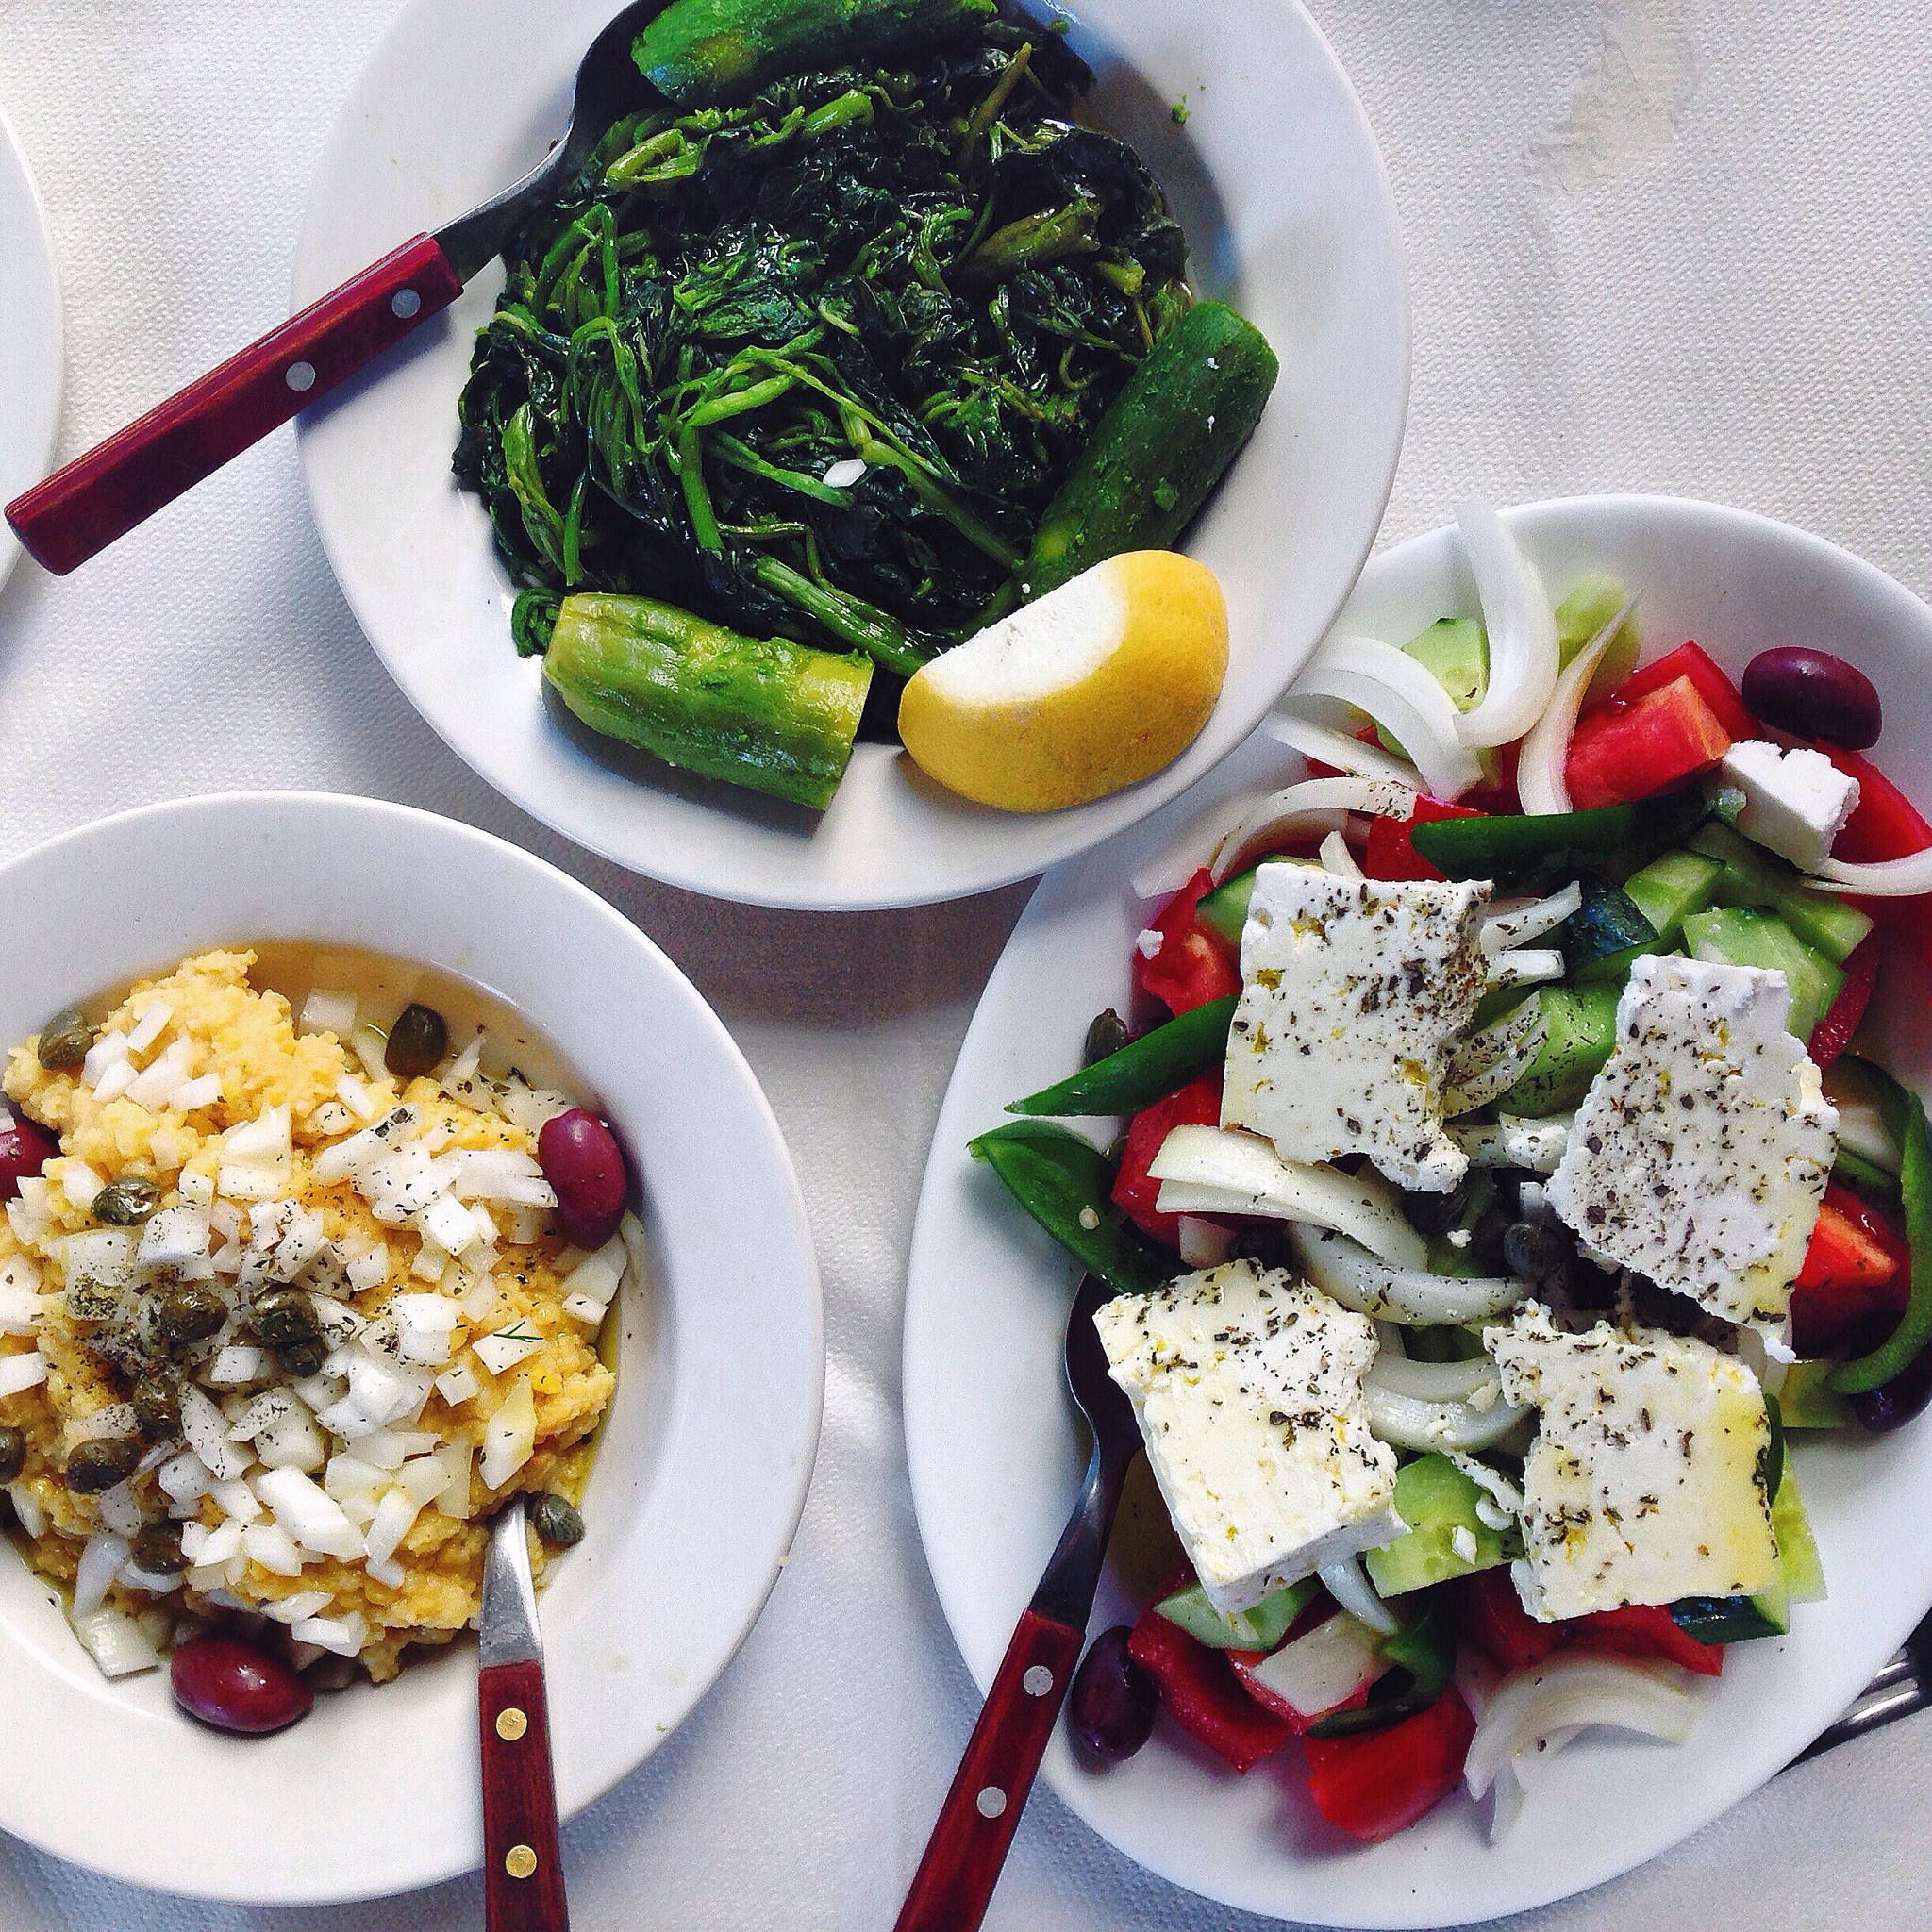 Sea diet of the Greek goddess